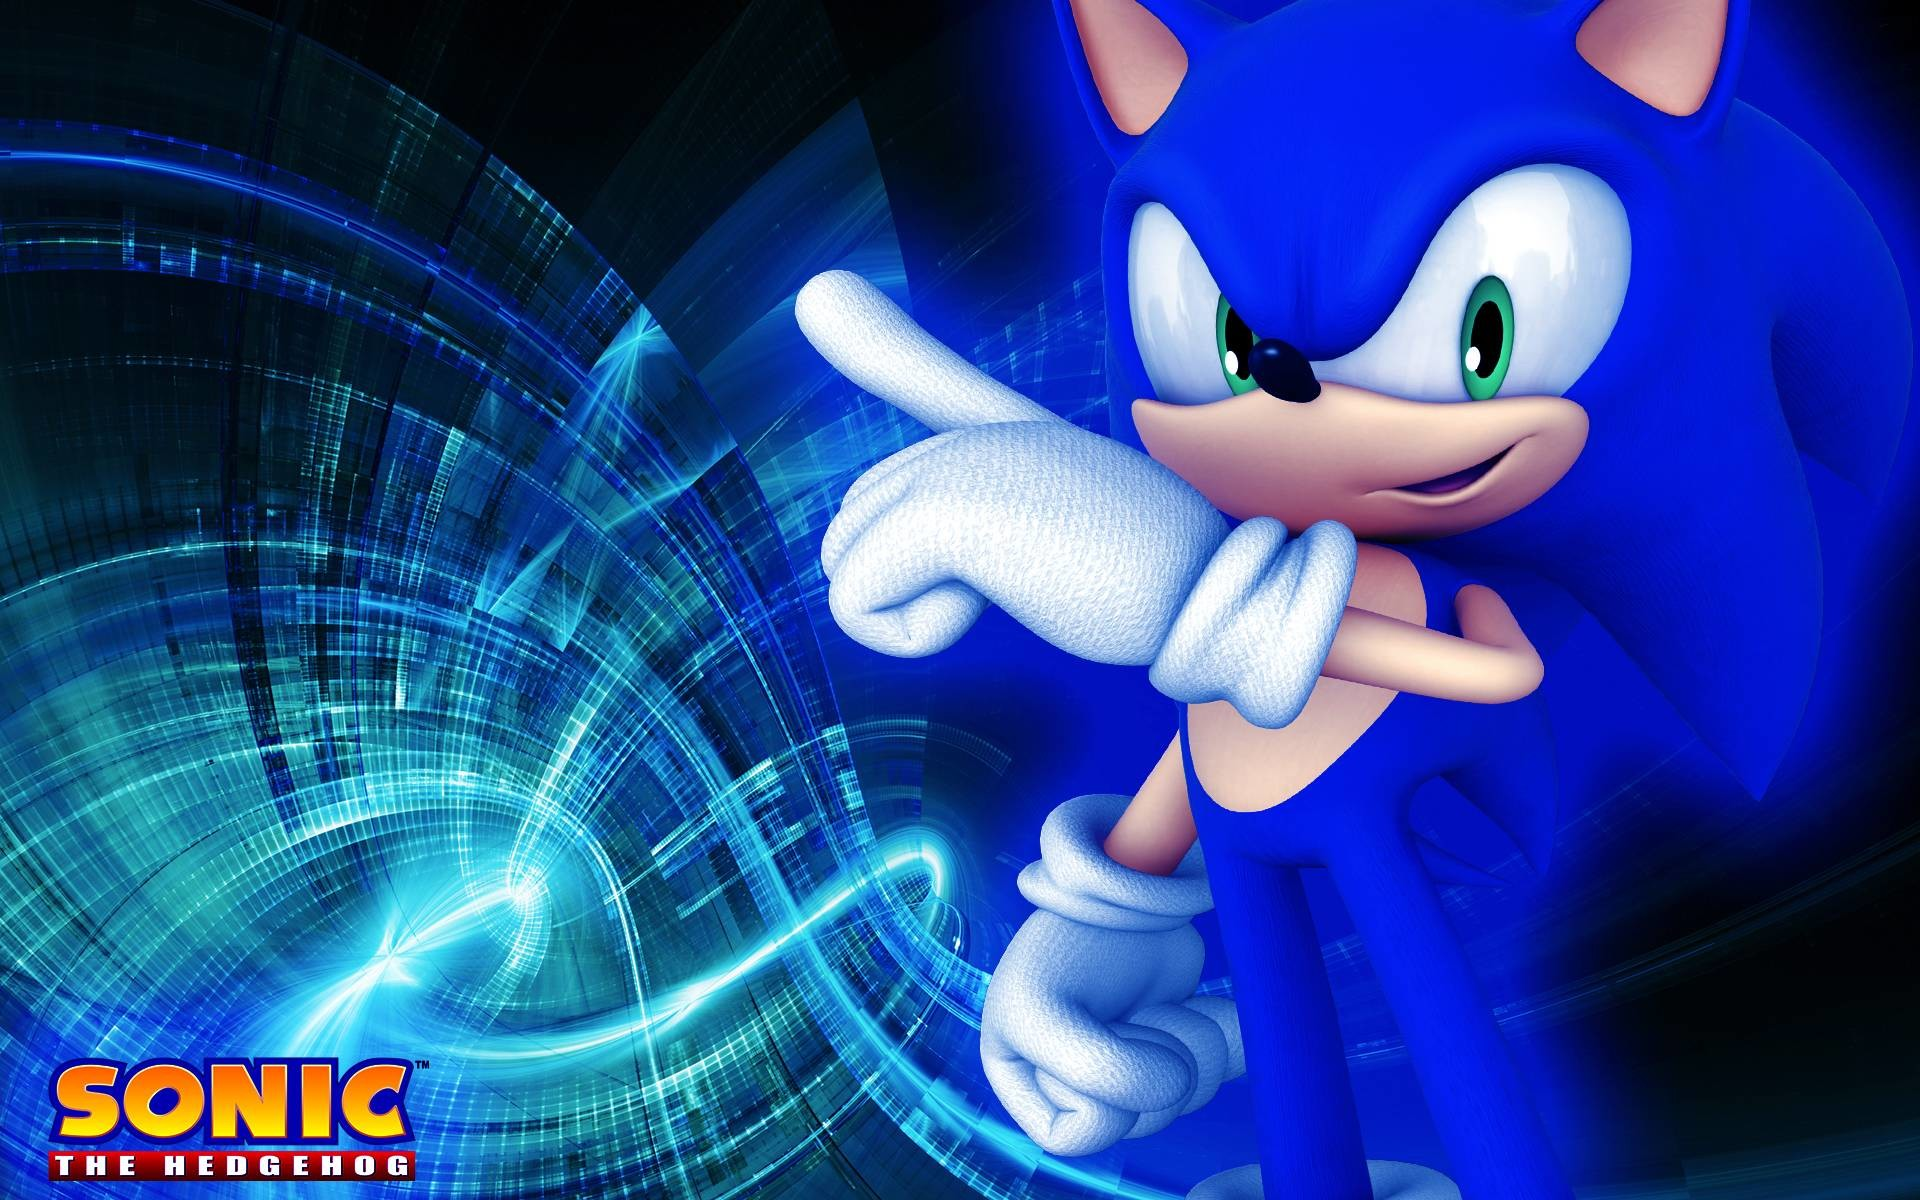 Sonic The Hedgehog – Wallpaper by SonicTheHedgehogBG on DeviantArt